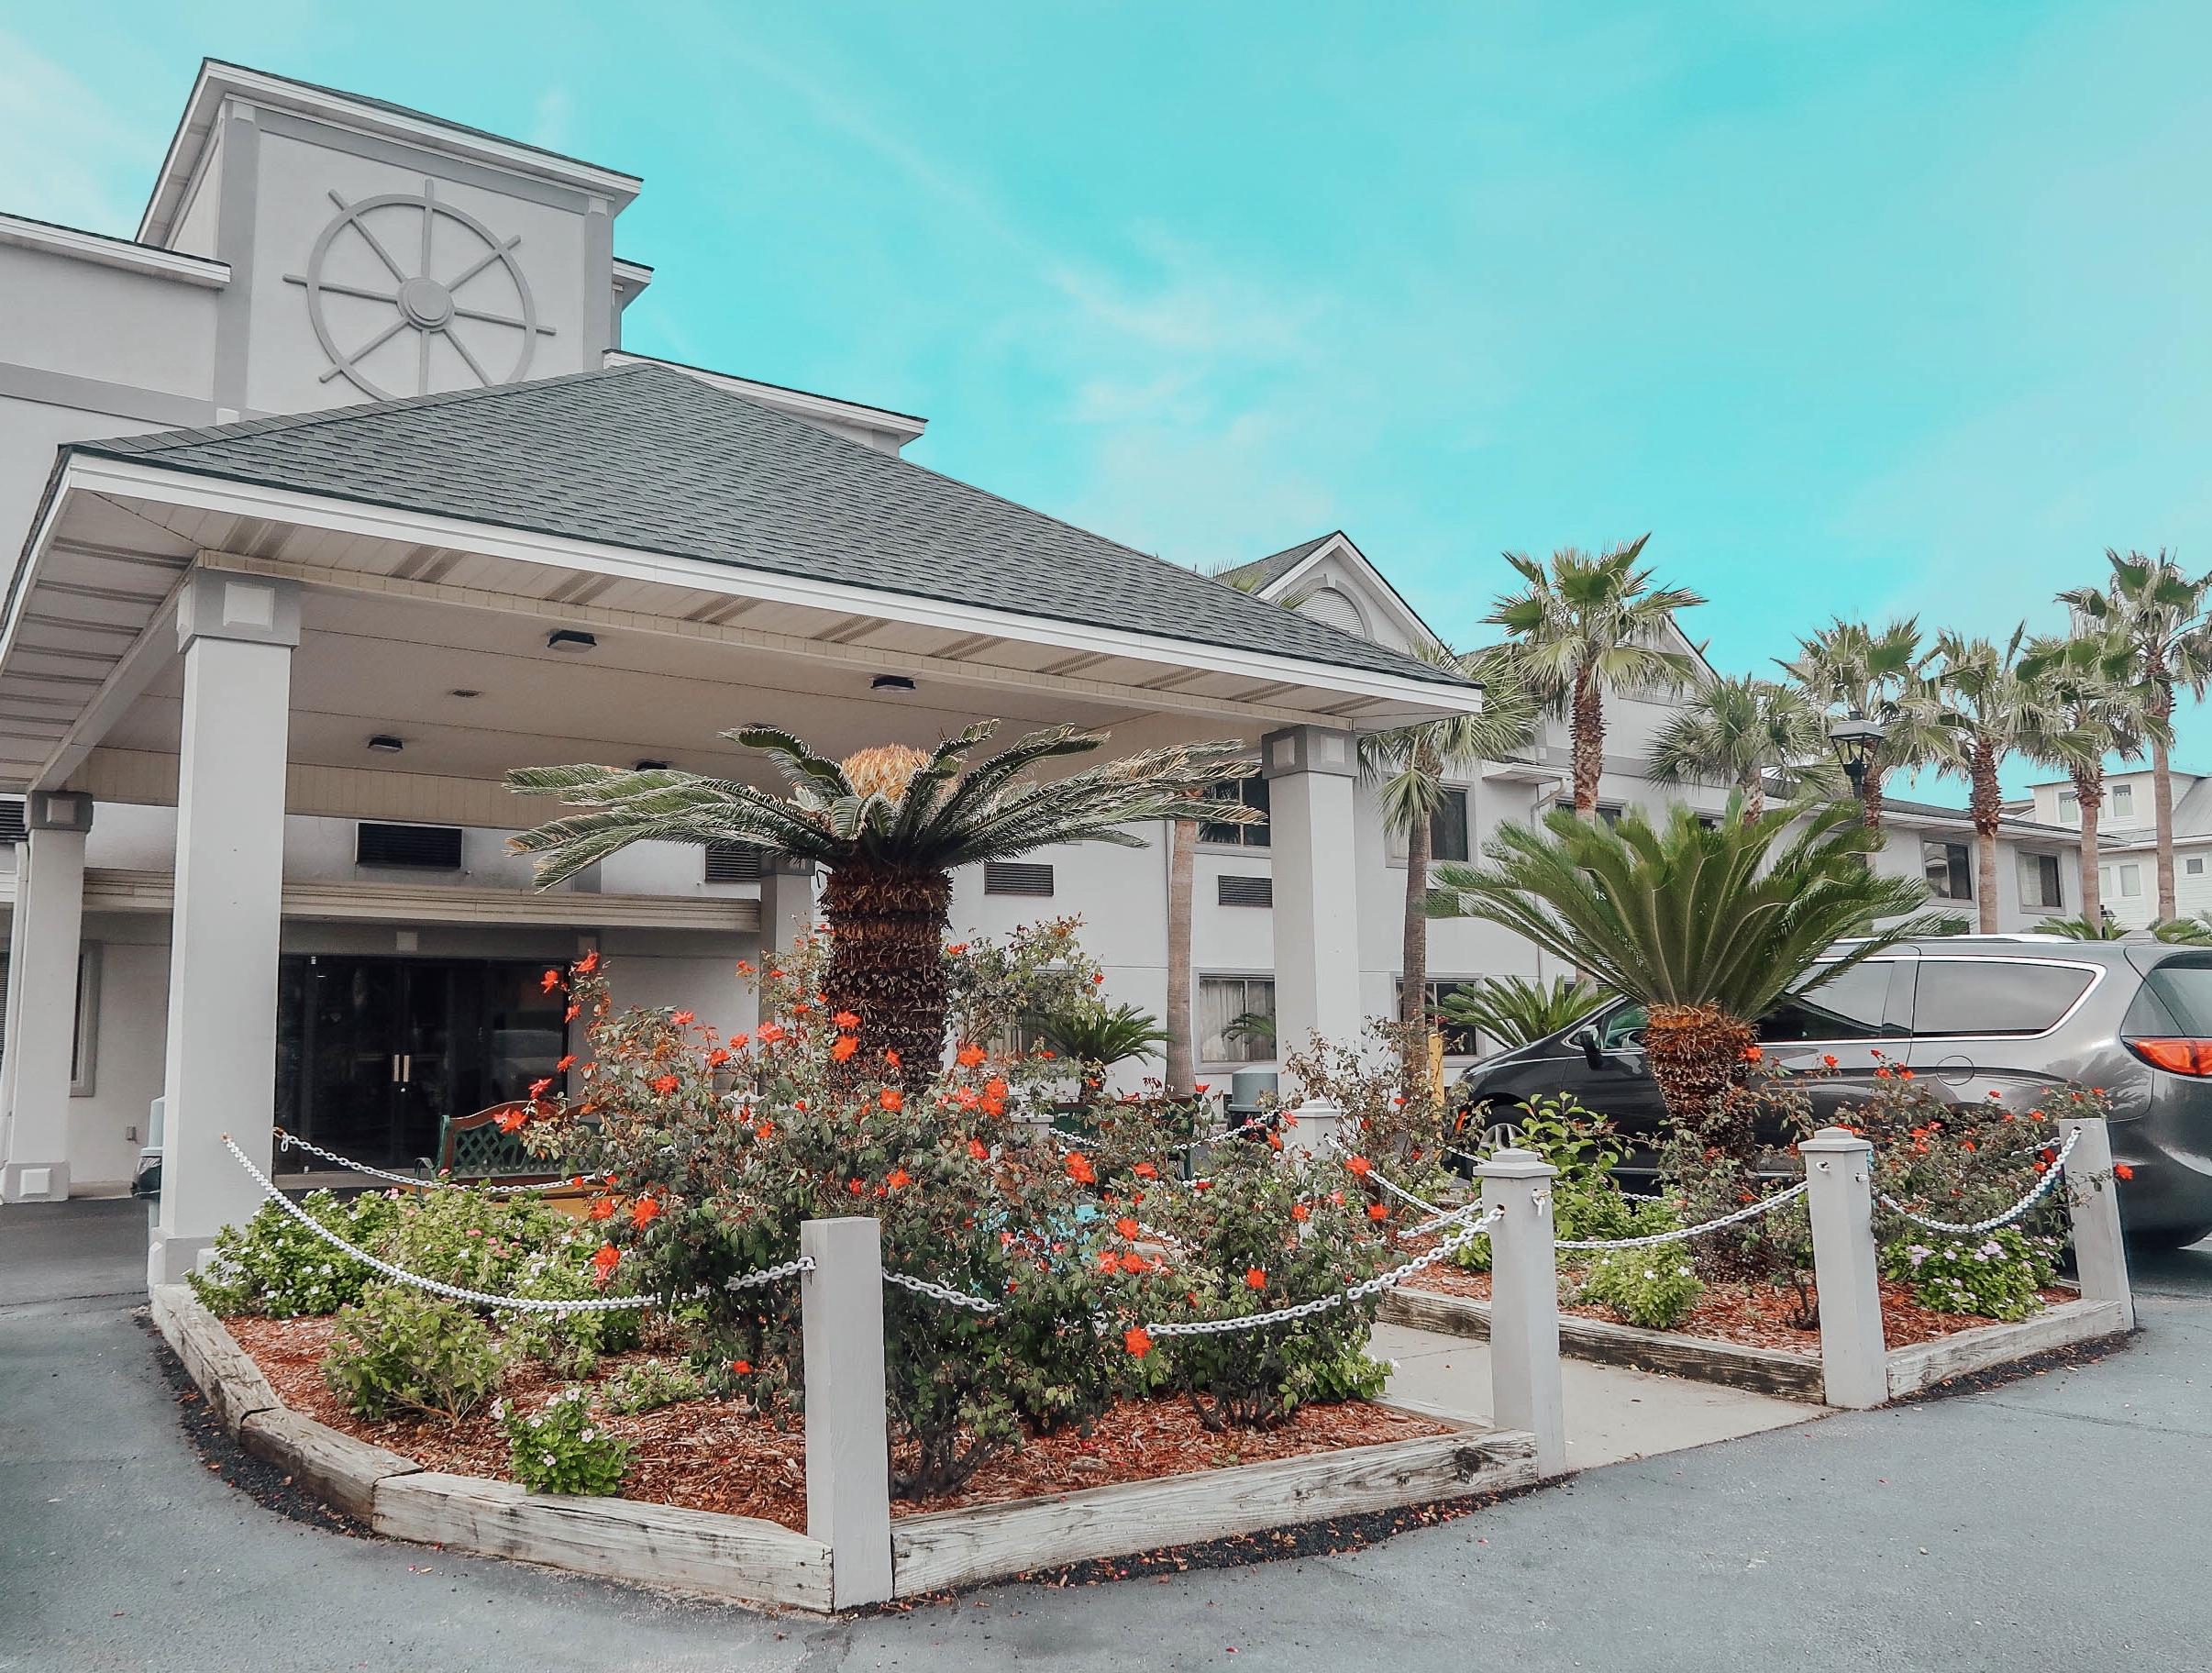 The Best Hotel on Tybee Island! – Admiral's Inn